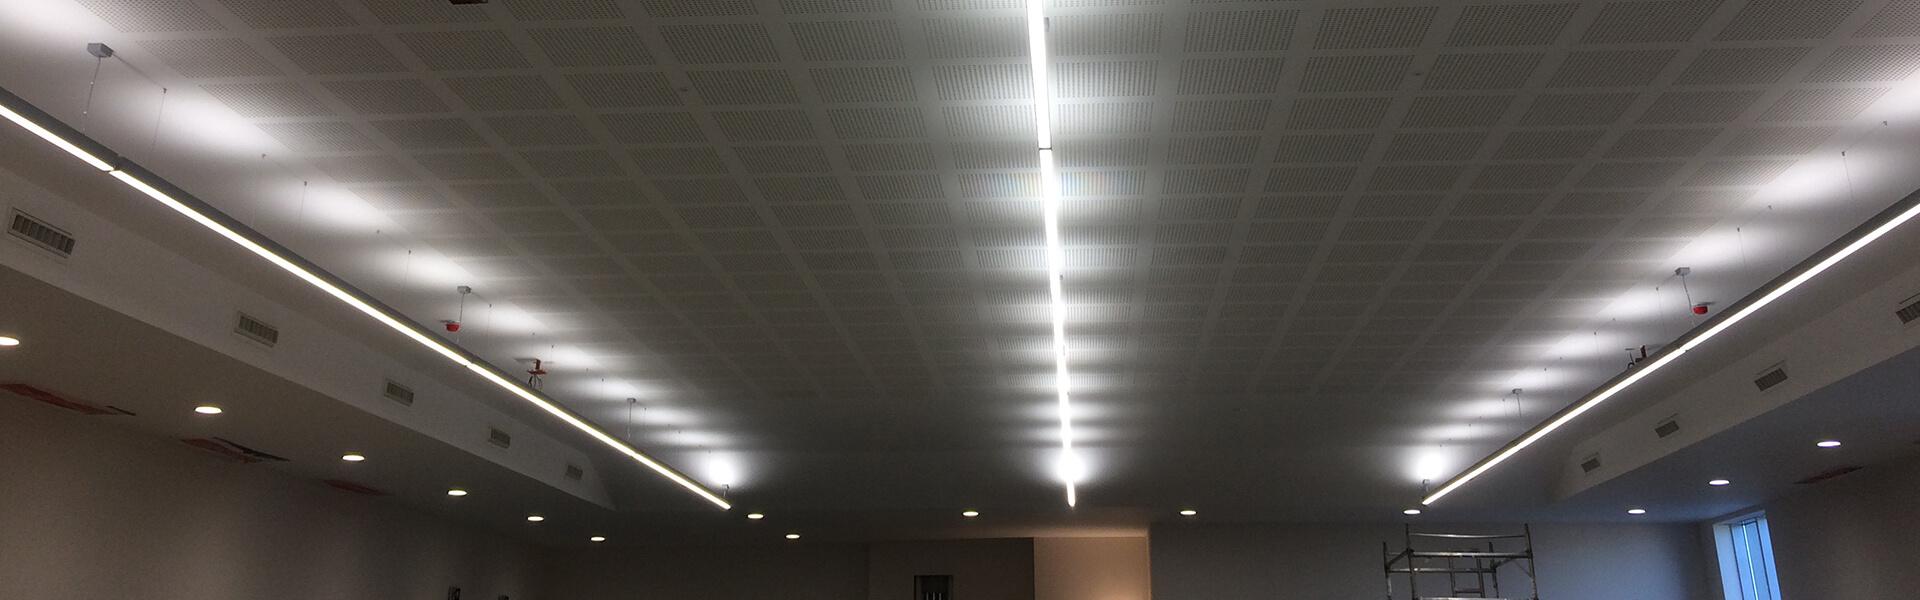 frameworks-contractor - SLP Interiors Ltd